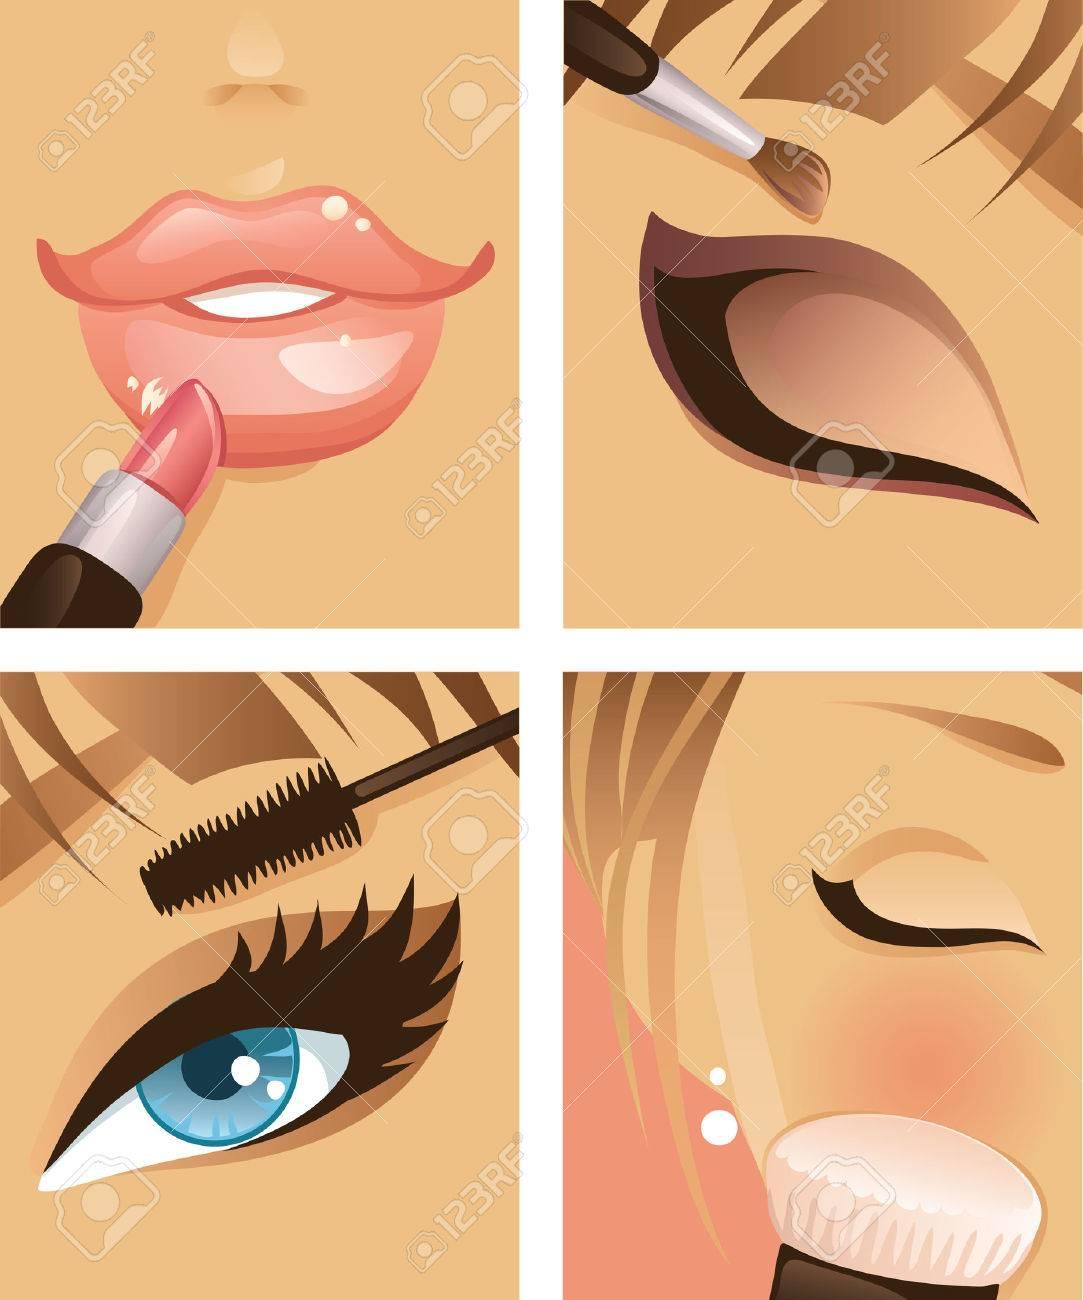 Make-up - 3117230